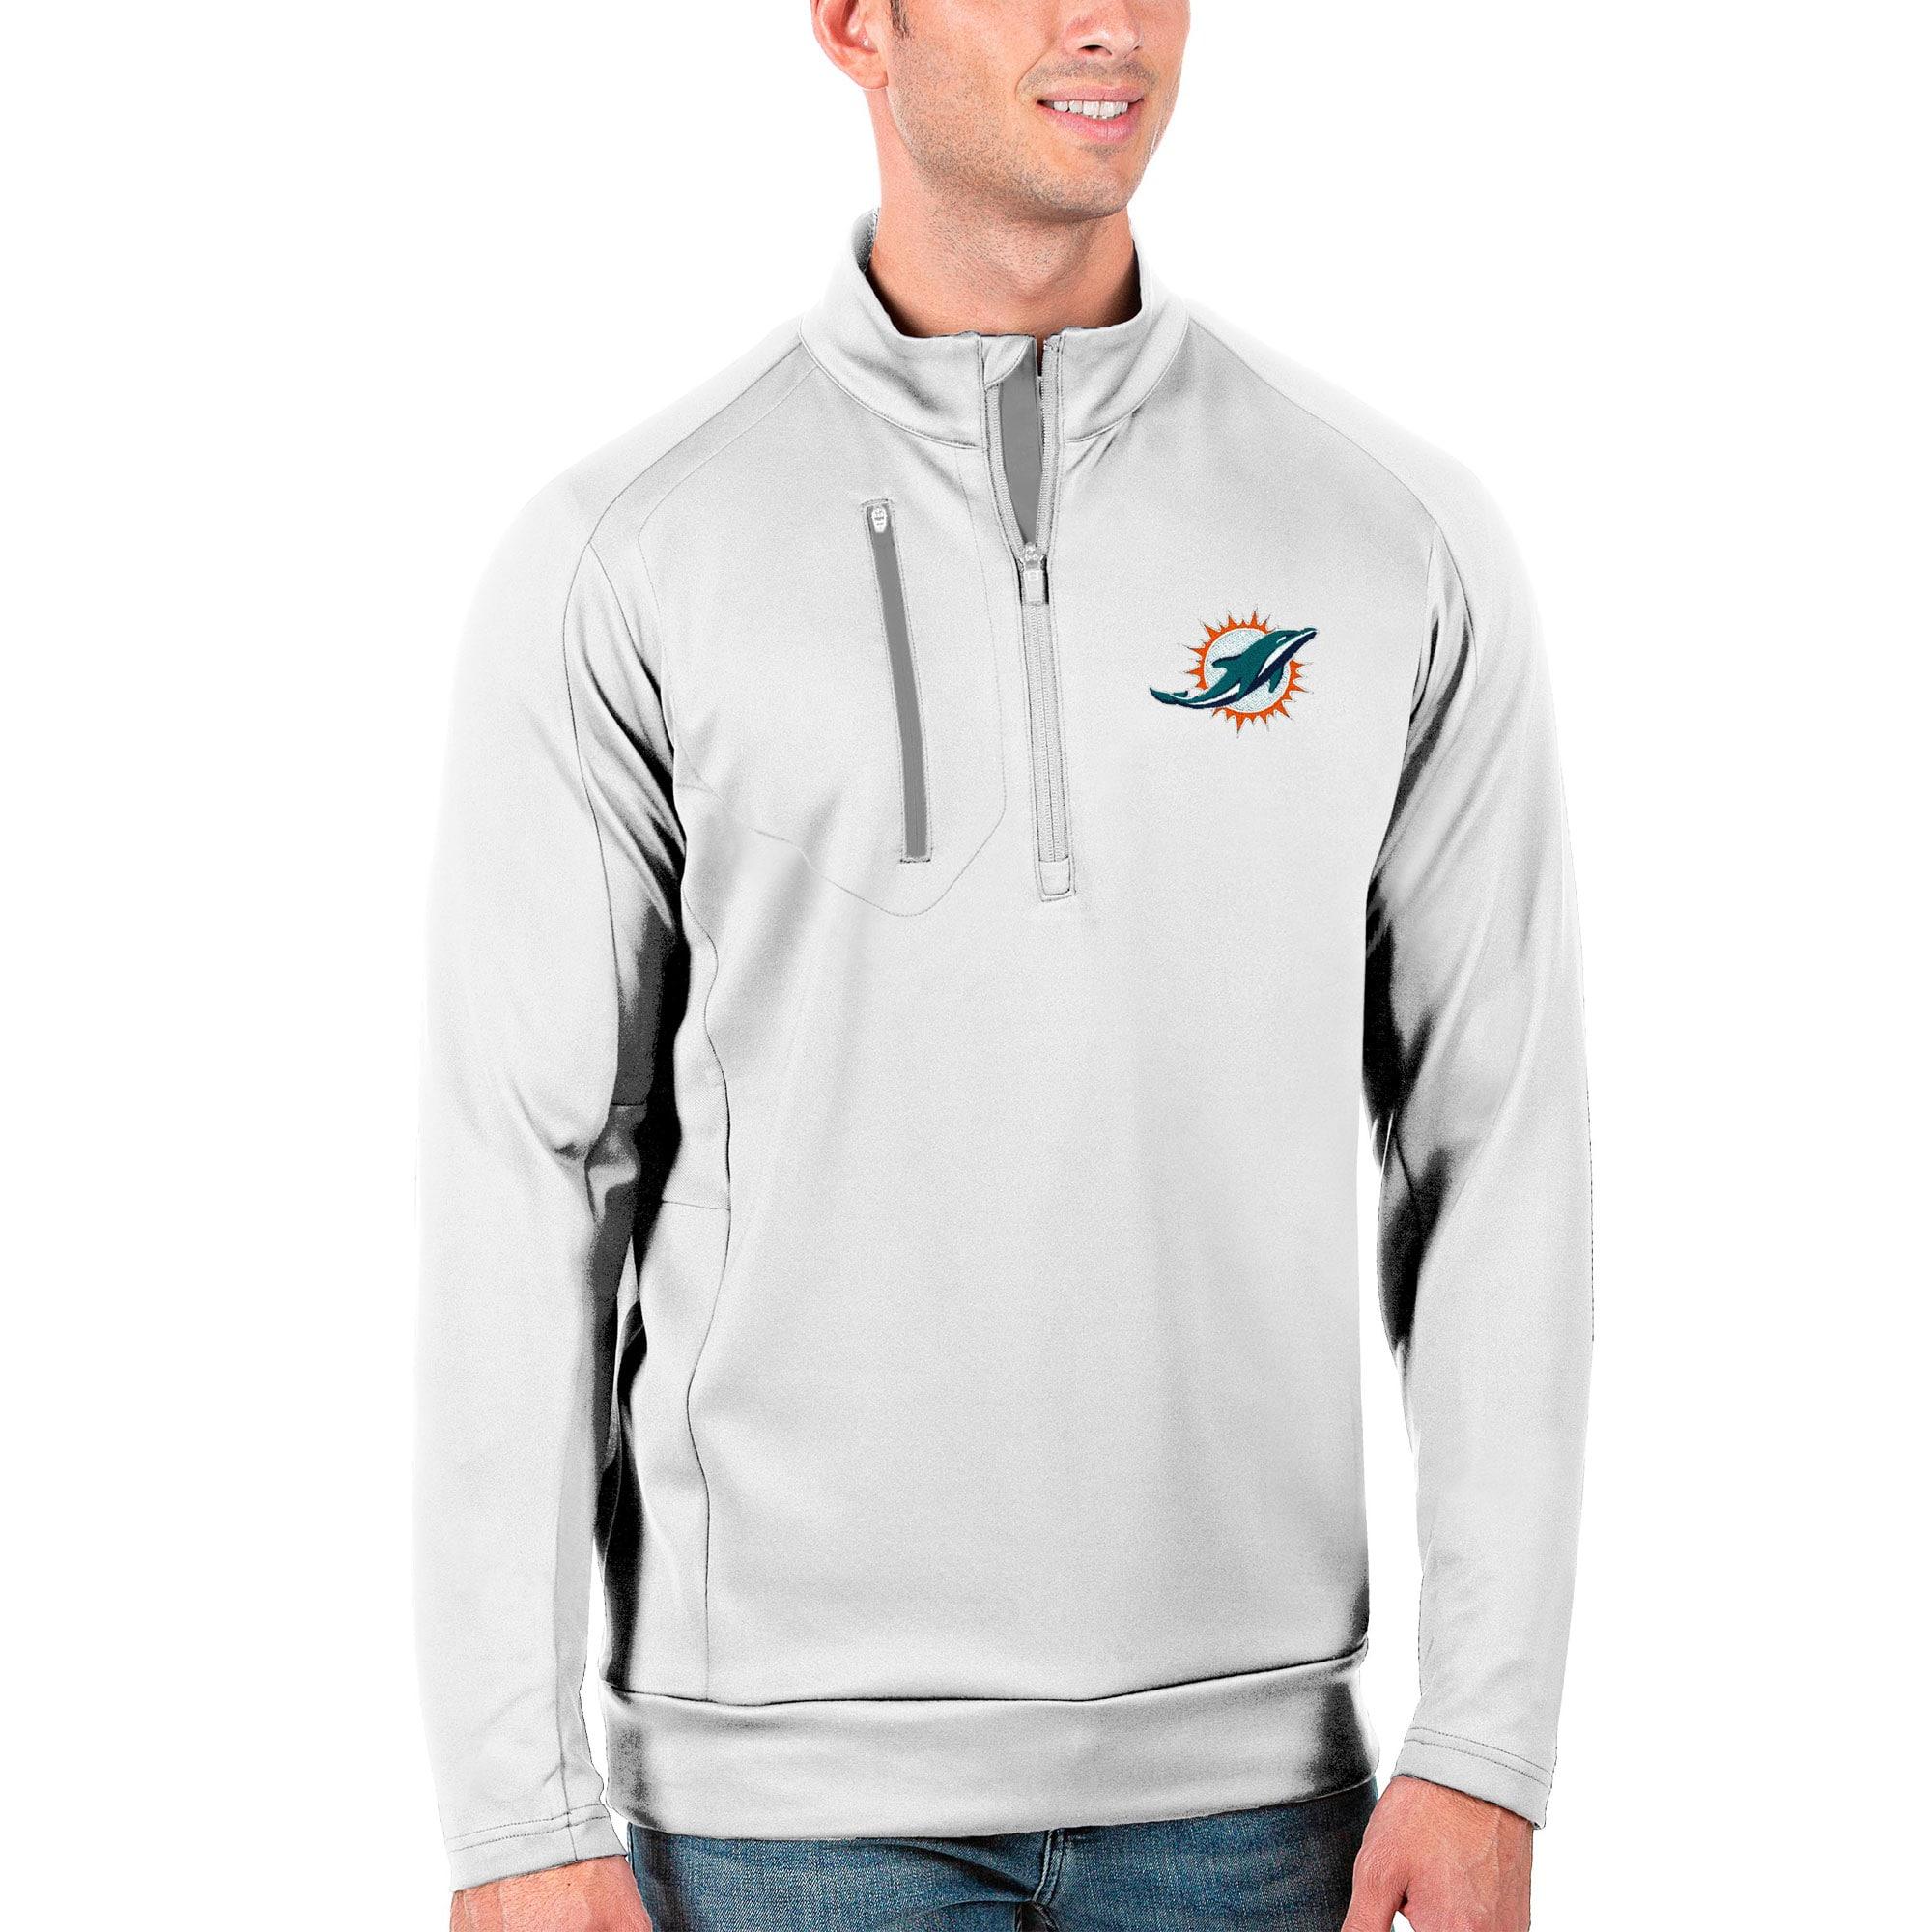 Miami Dolphins Antigua Generation Quarter-Zip Pullover Jacket - White/Silver